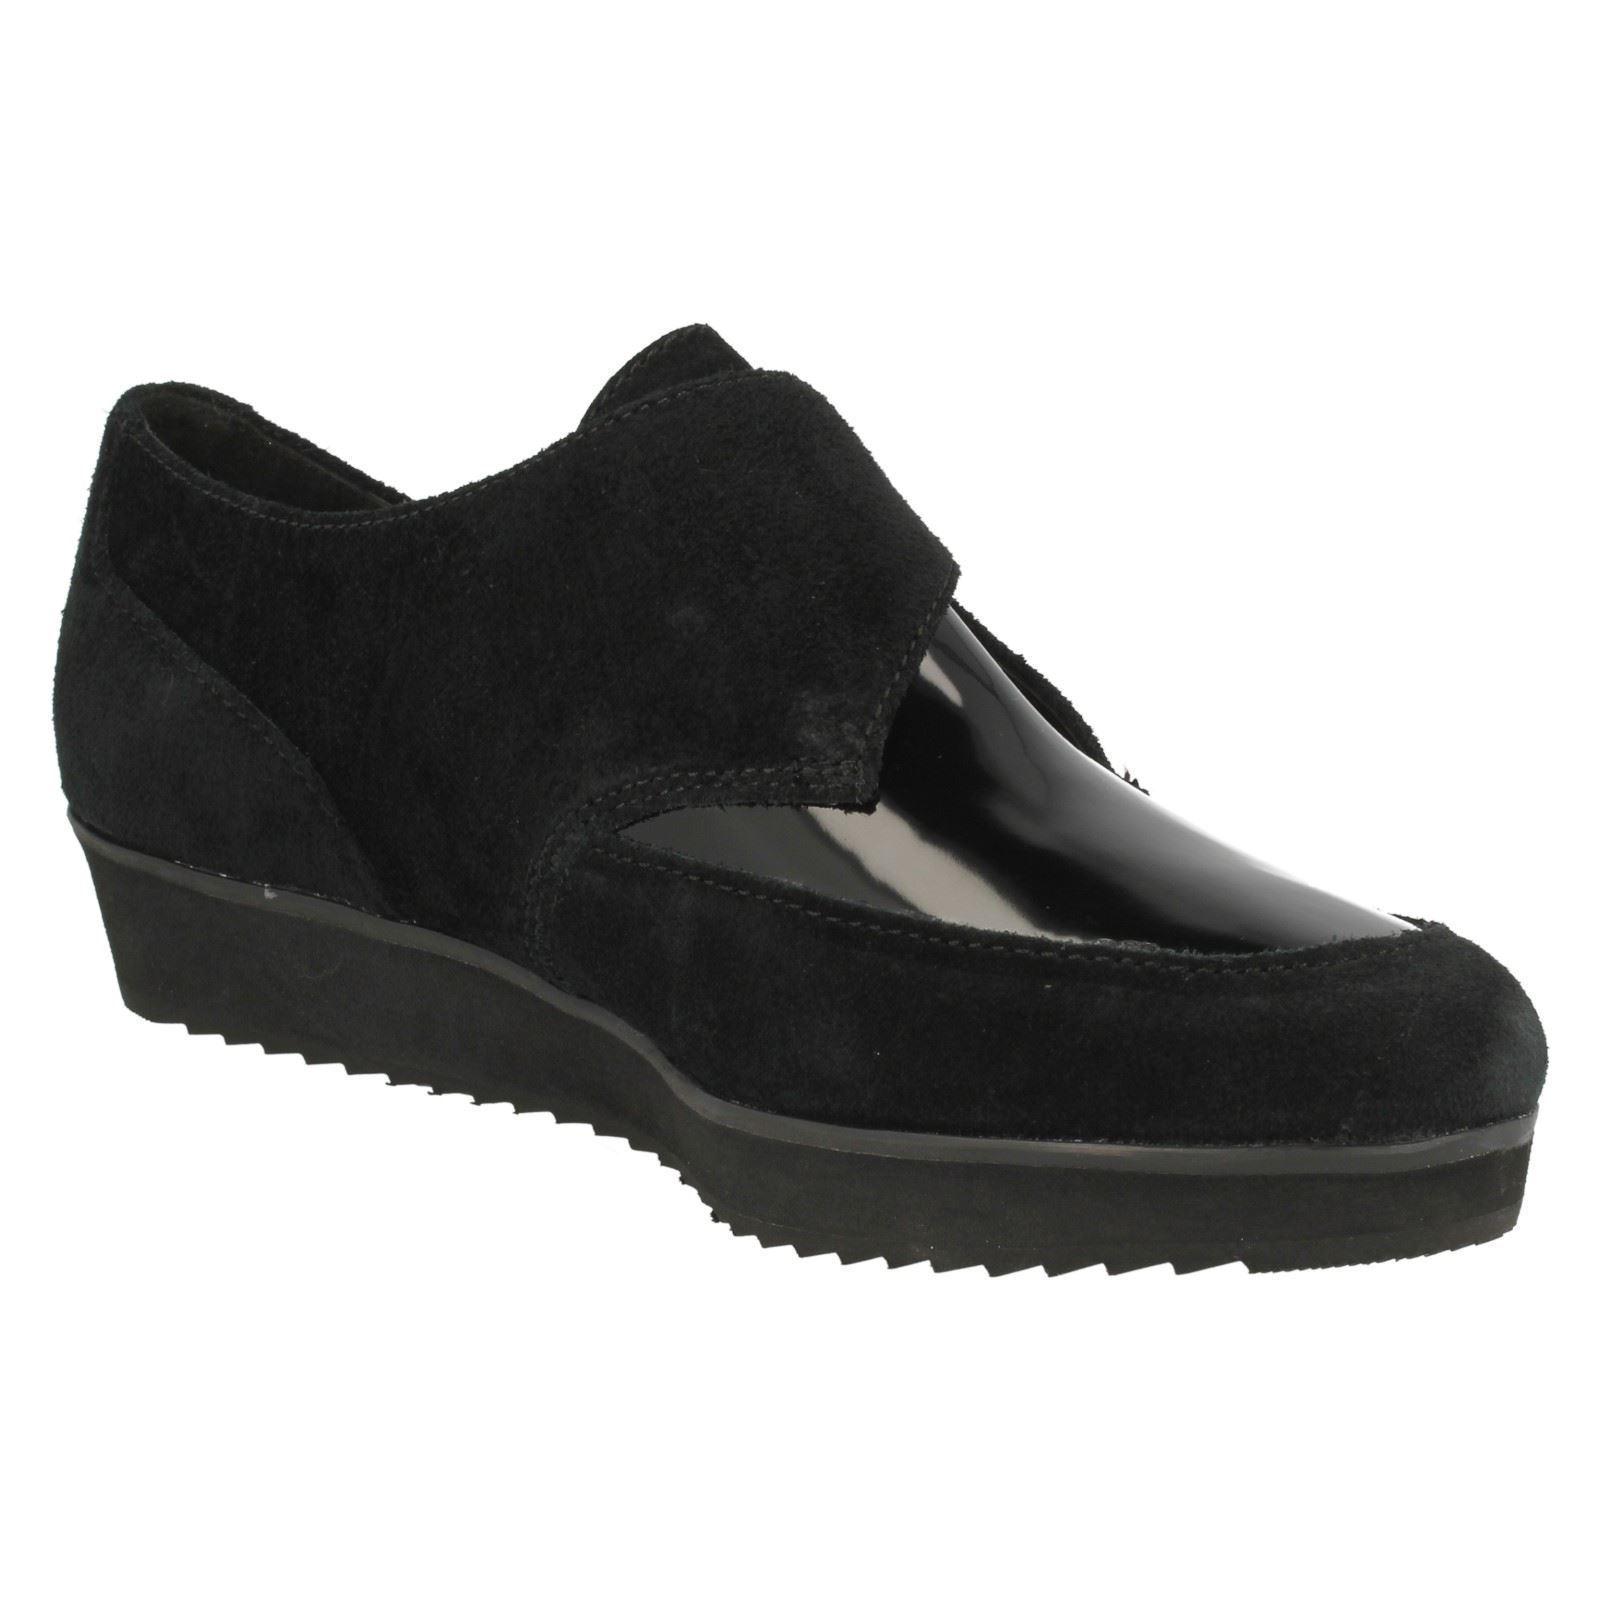 Ladies Buckle Casual K Shoes Clarks 'compass Point' Black ~ zrzqUF